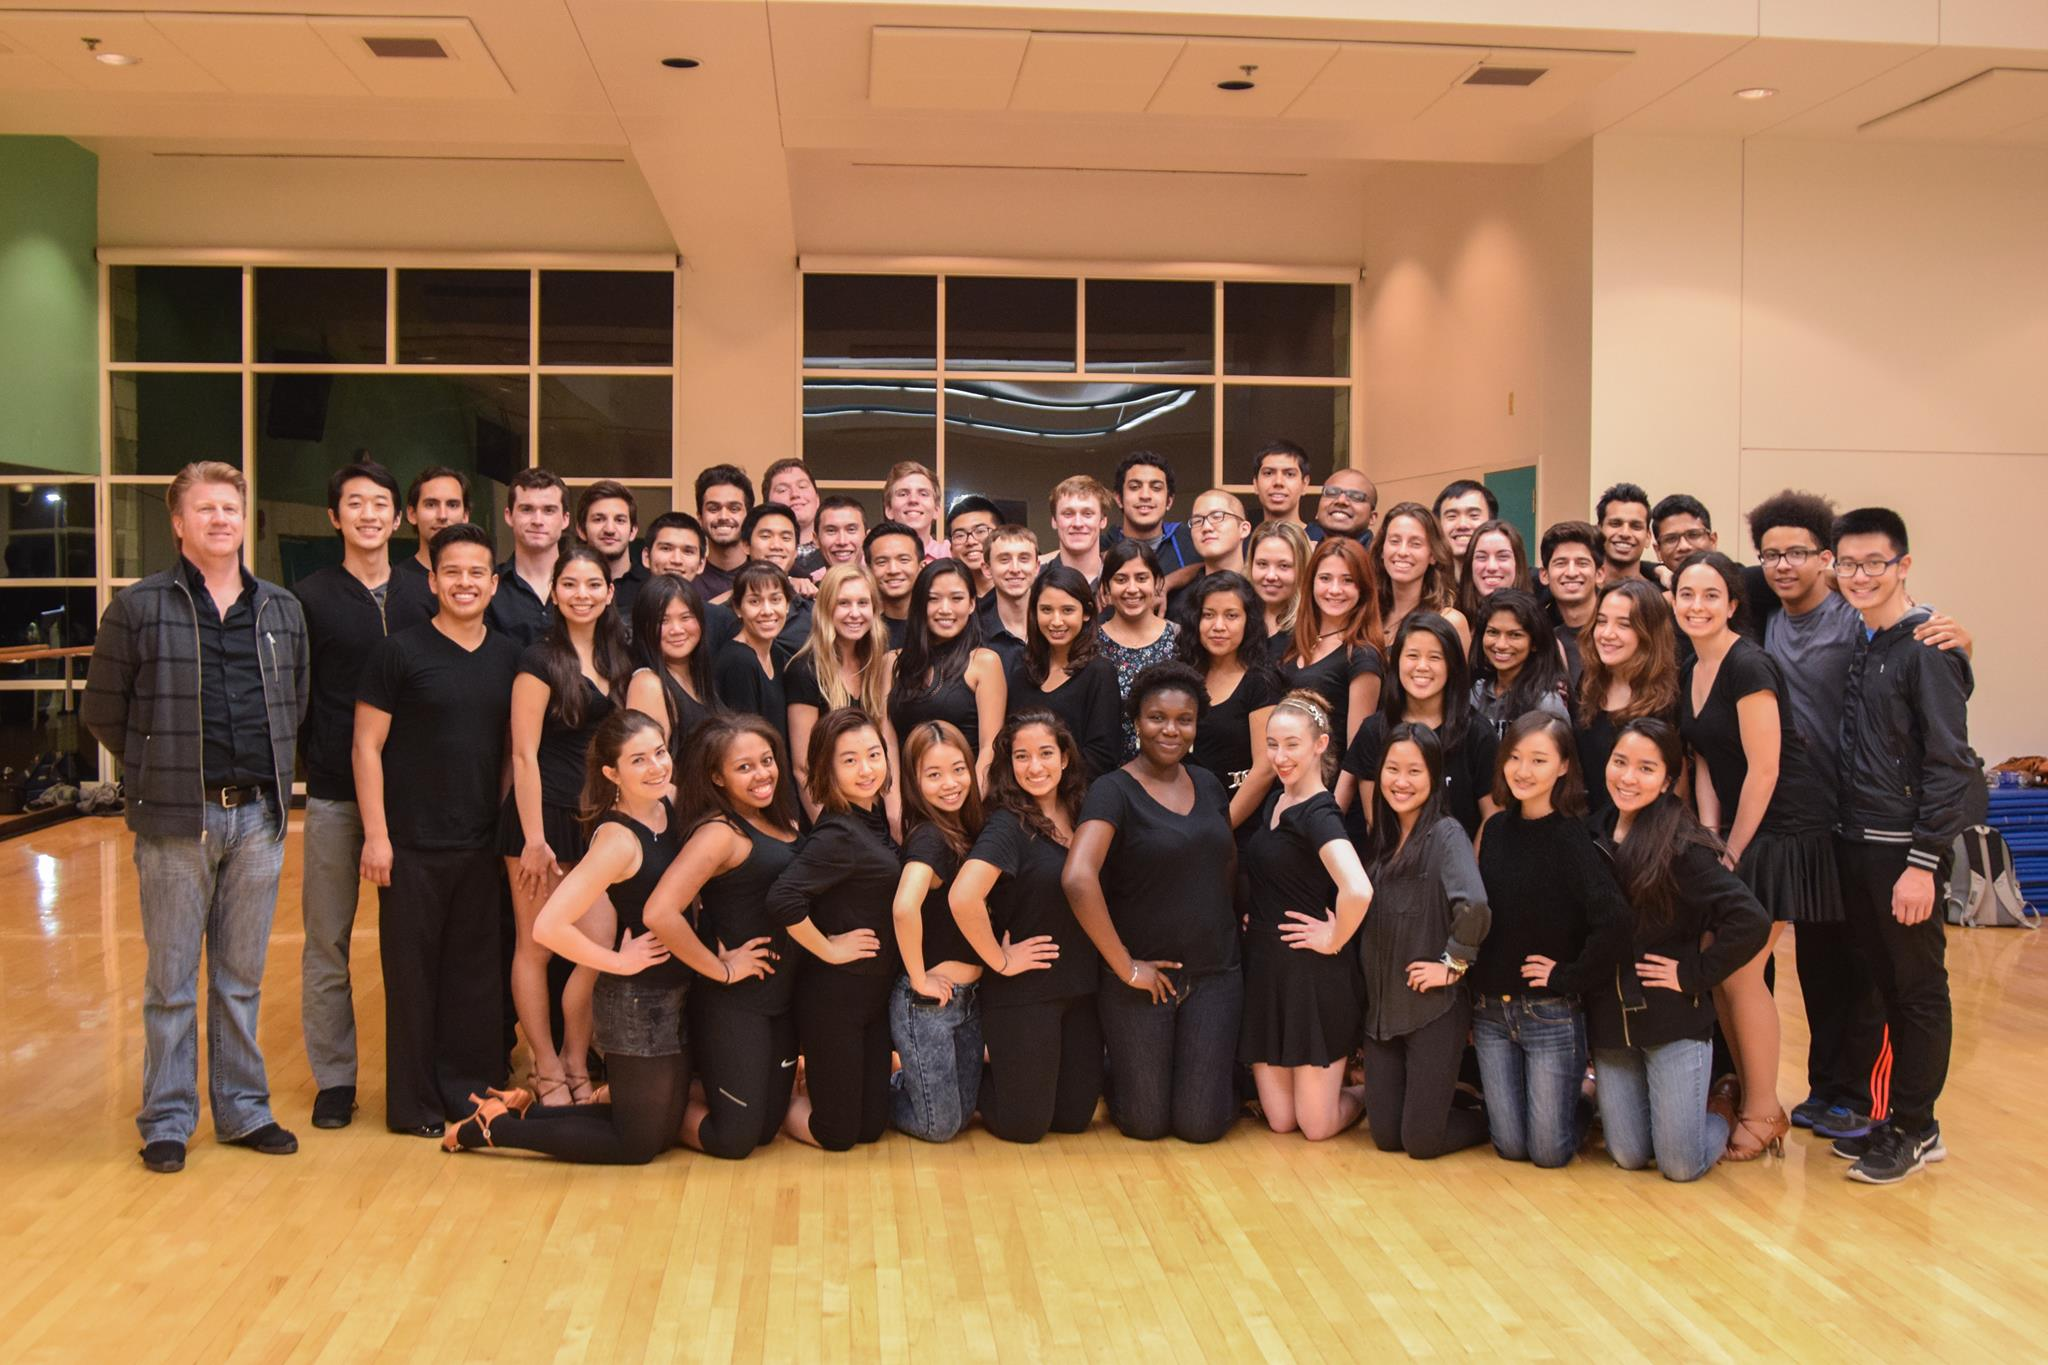 The entire UCSD DanceSport team